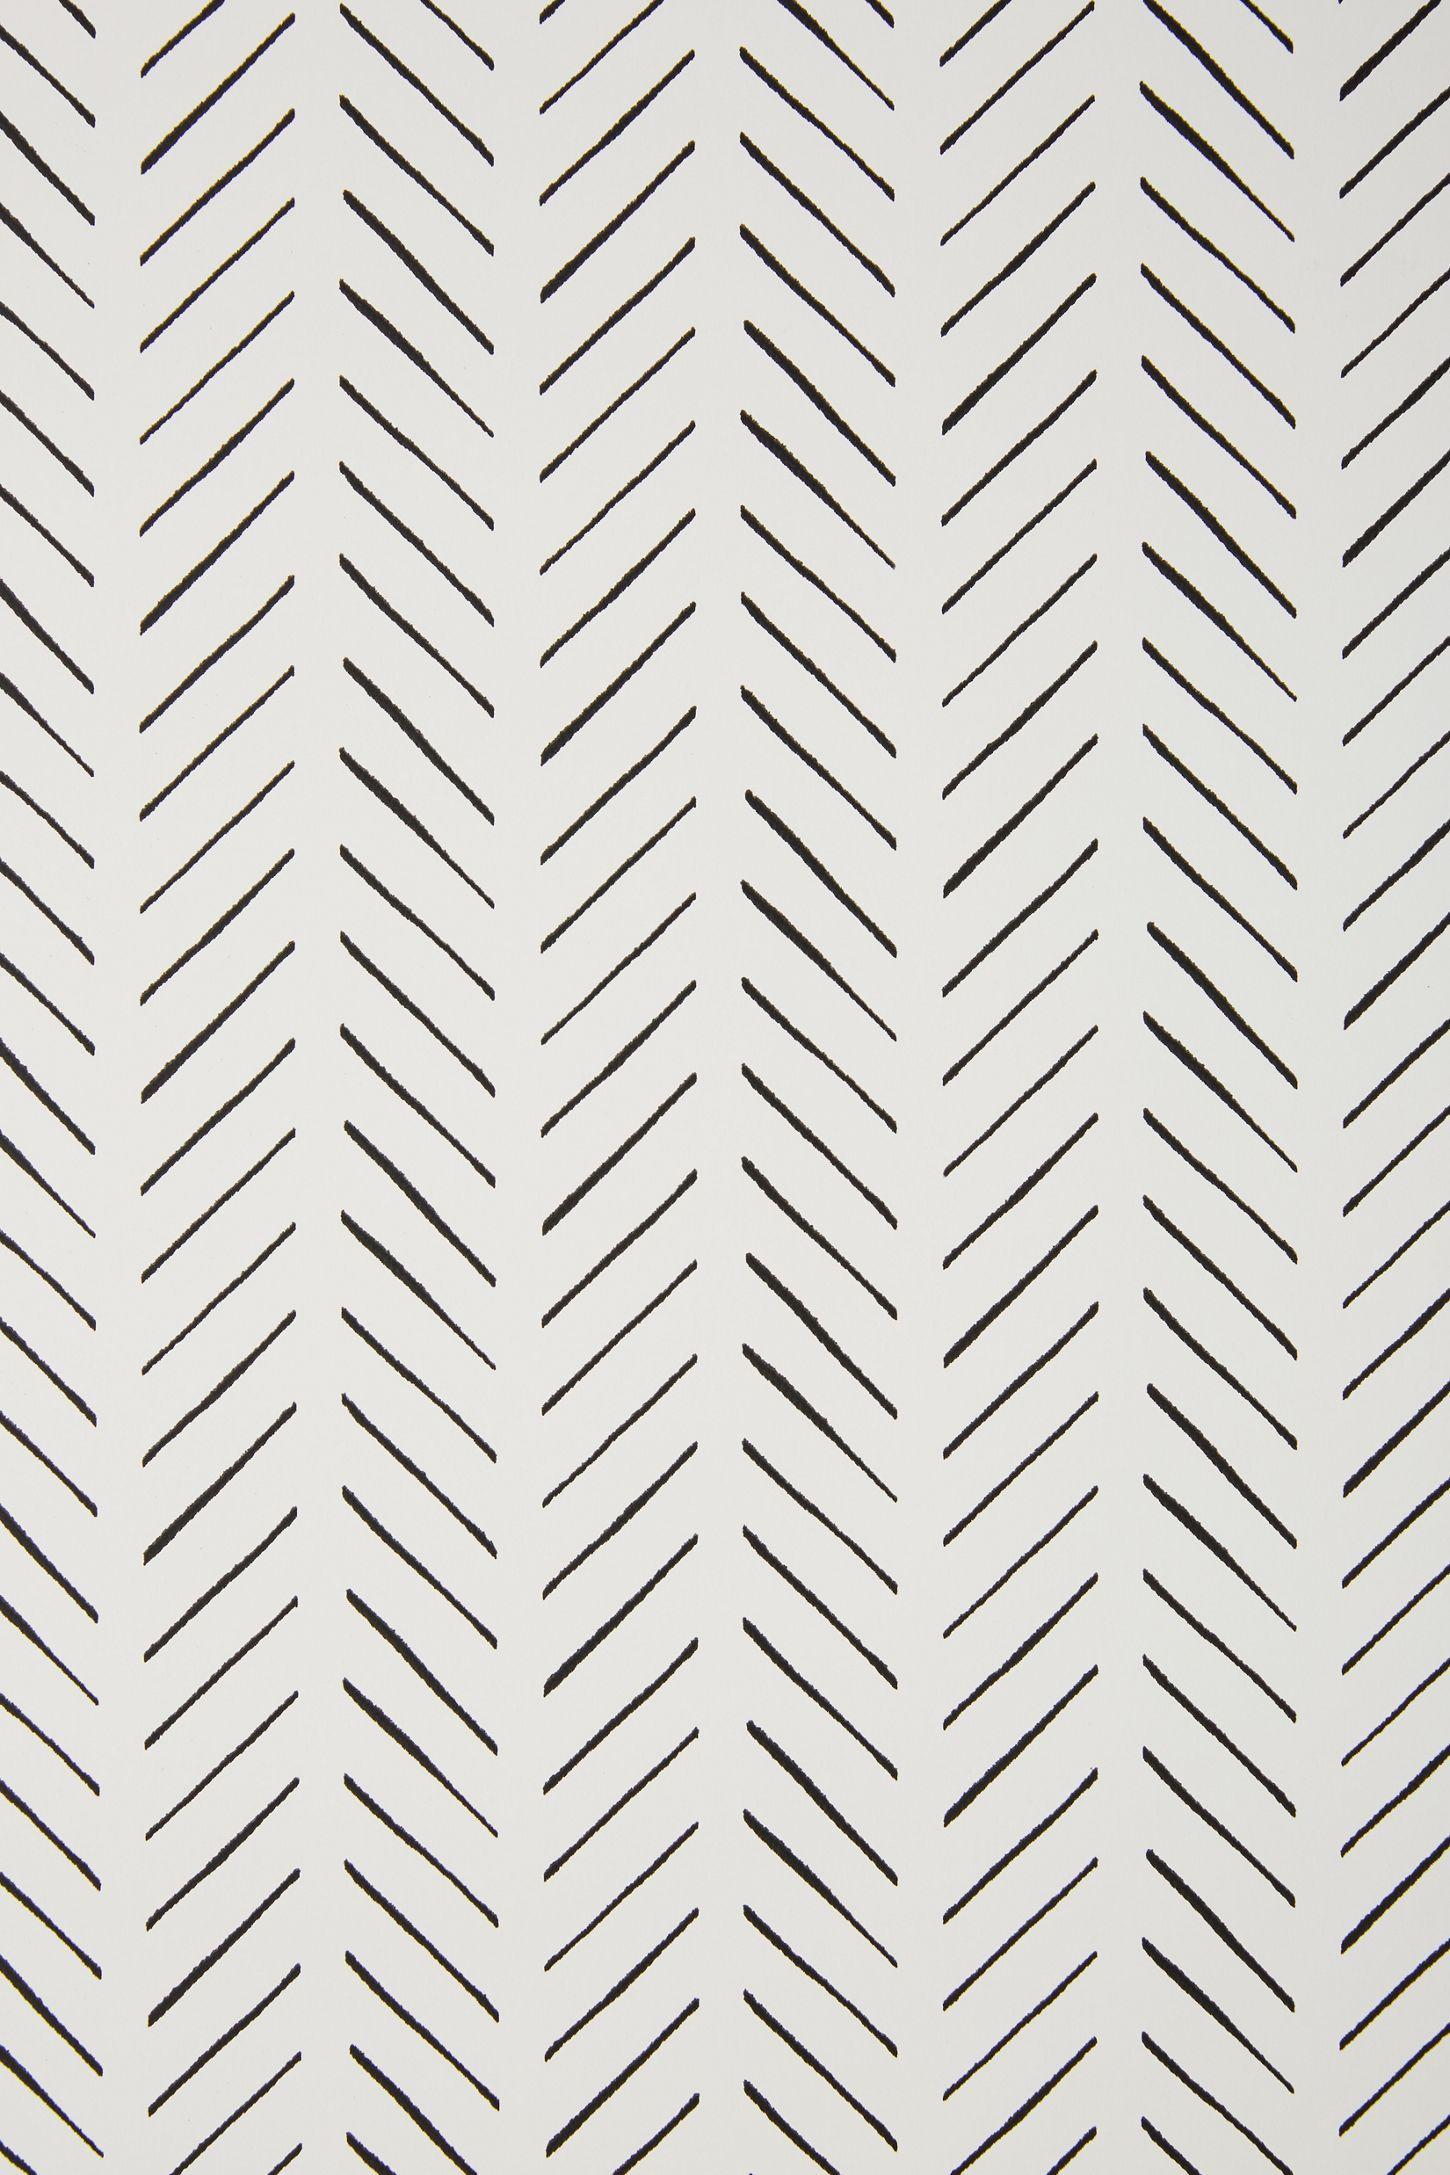 Magnolia Home Pick Up Sticks Wallpaper In 2021 Playroom Wallpaper Wallpaper Iphone Boho Black And White Wallpaper